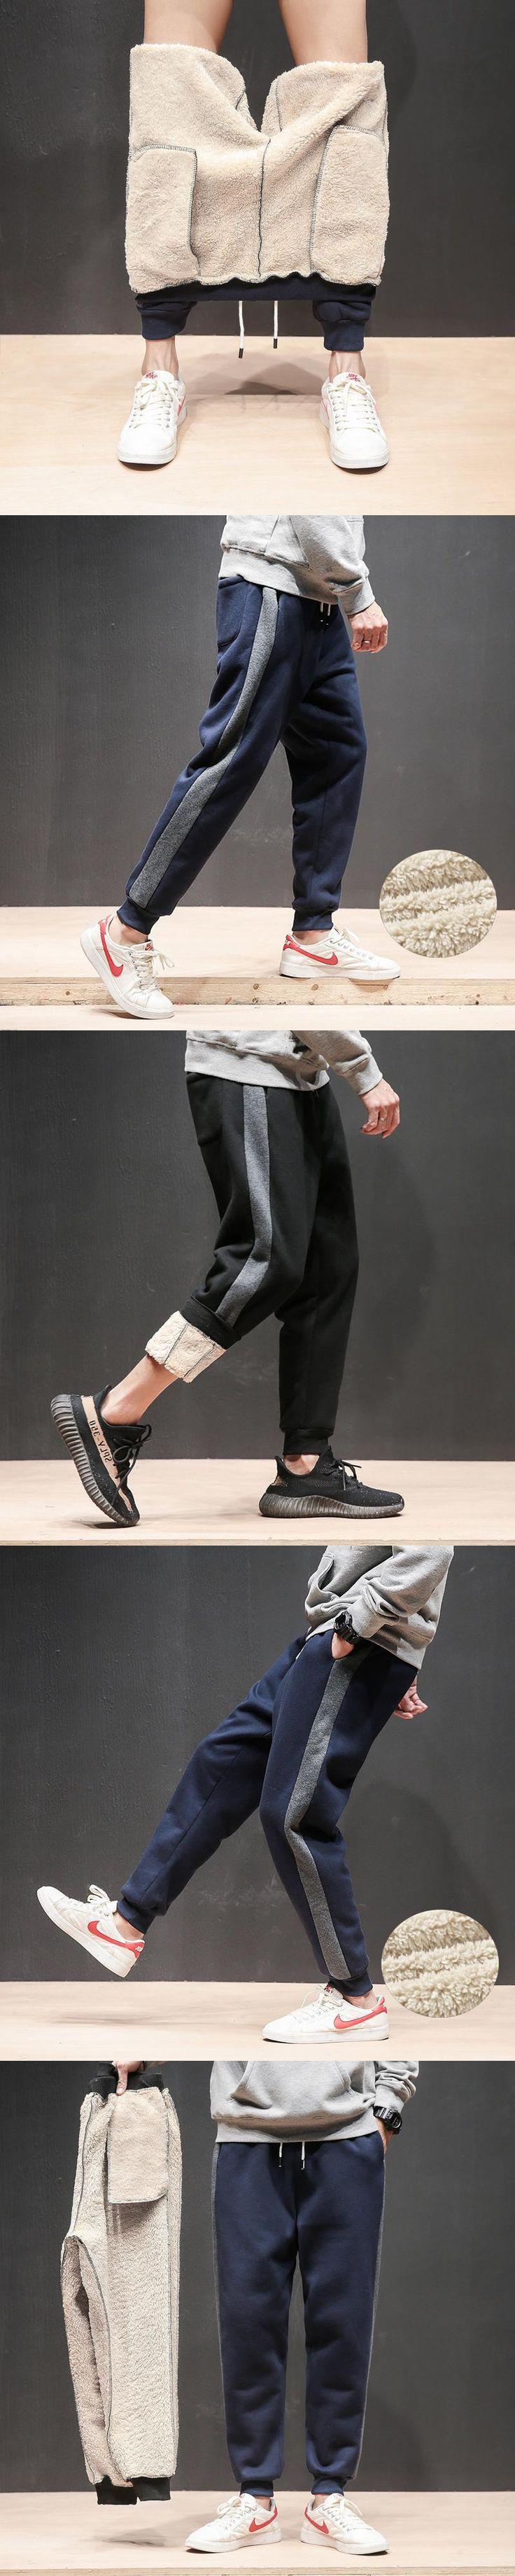 2017 Winter Increase Thickening Hit Color Fashion Lamb Feet Leisure Pants Men Keep Warm  Windbreak Pocket Pantalon Hombre Stripe